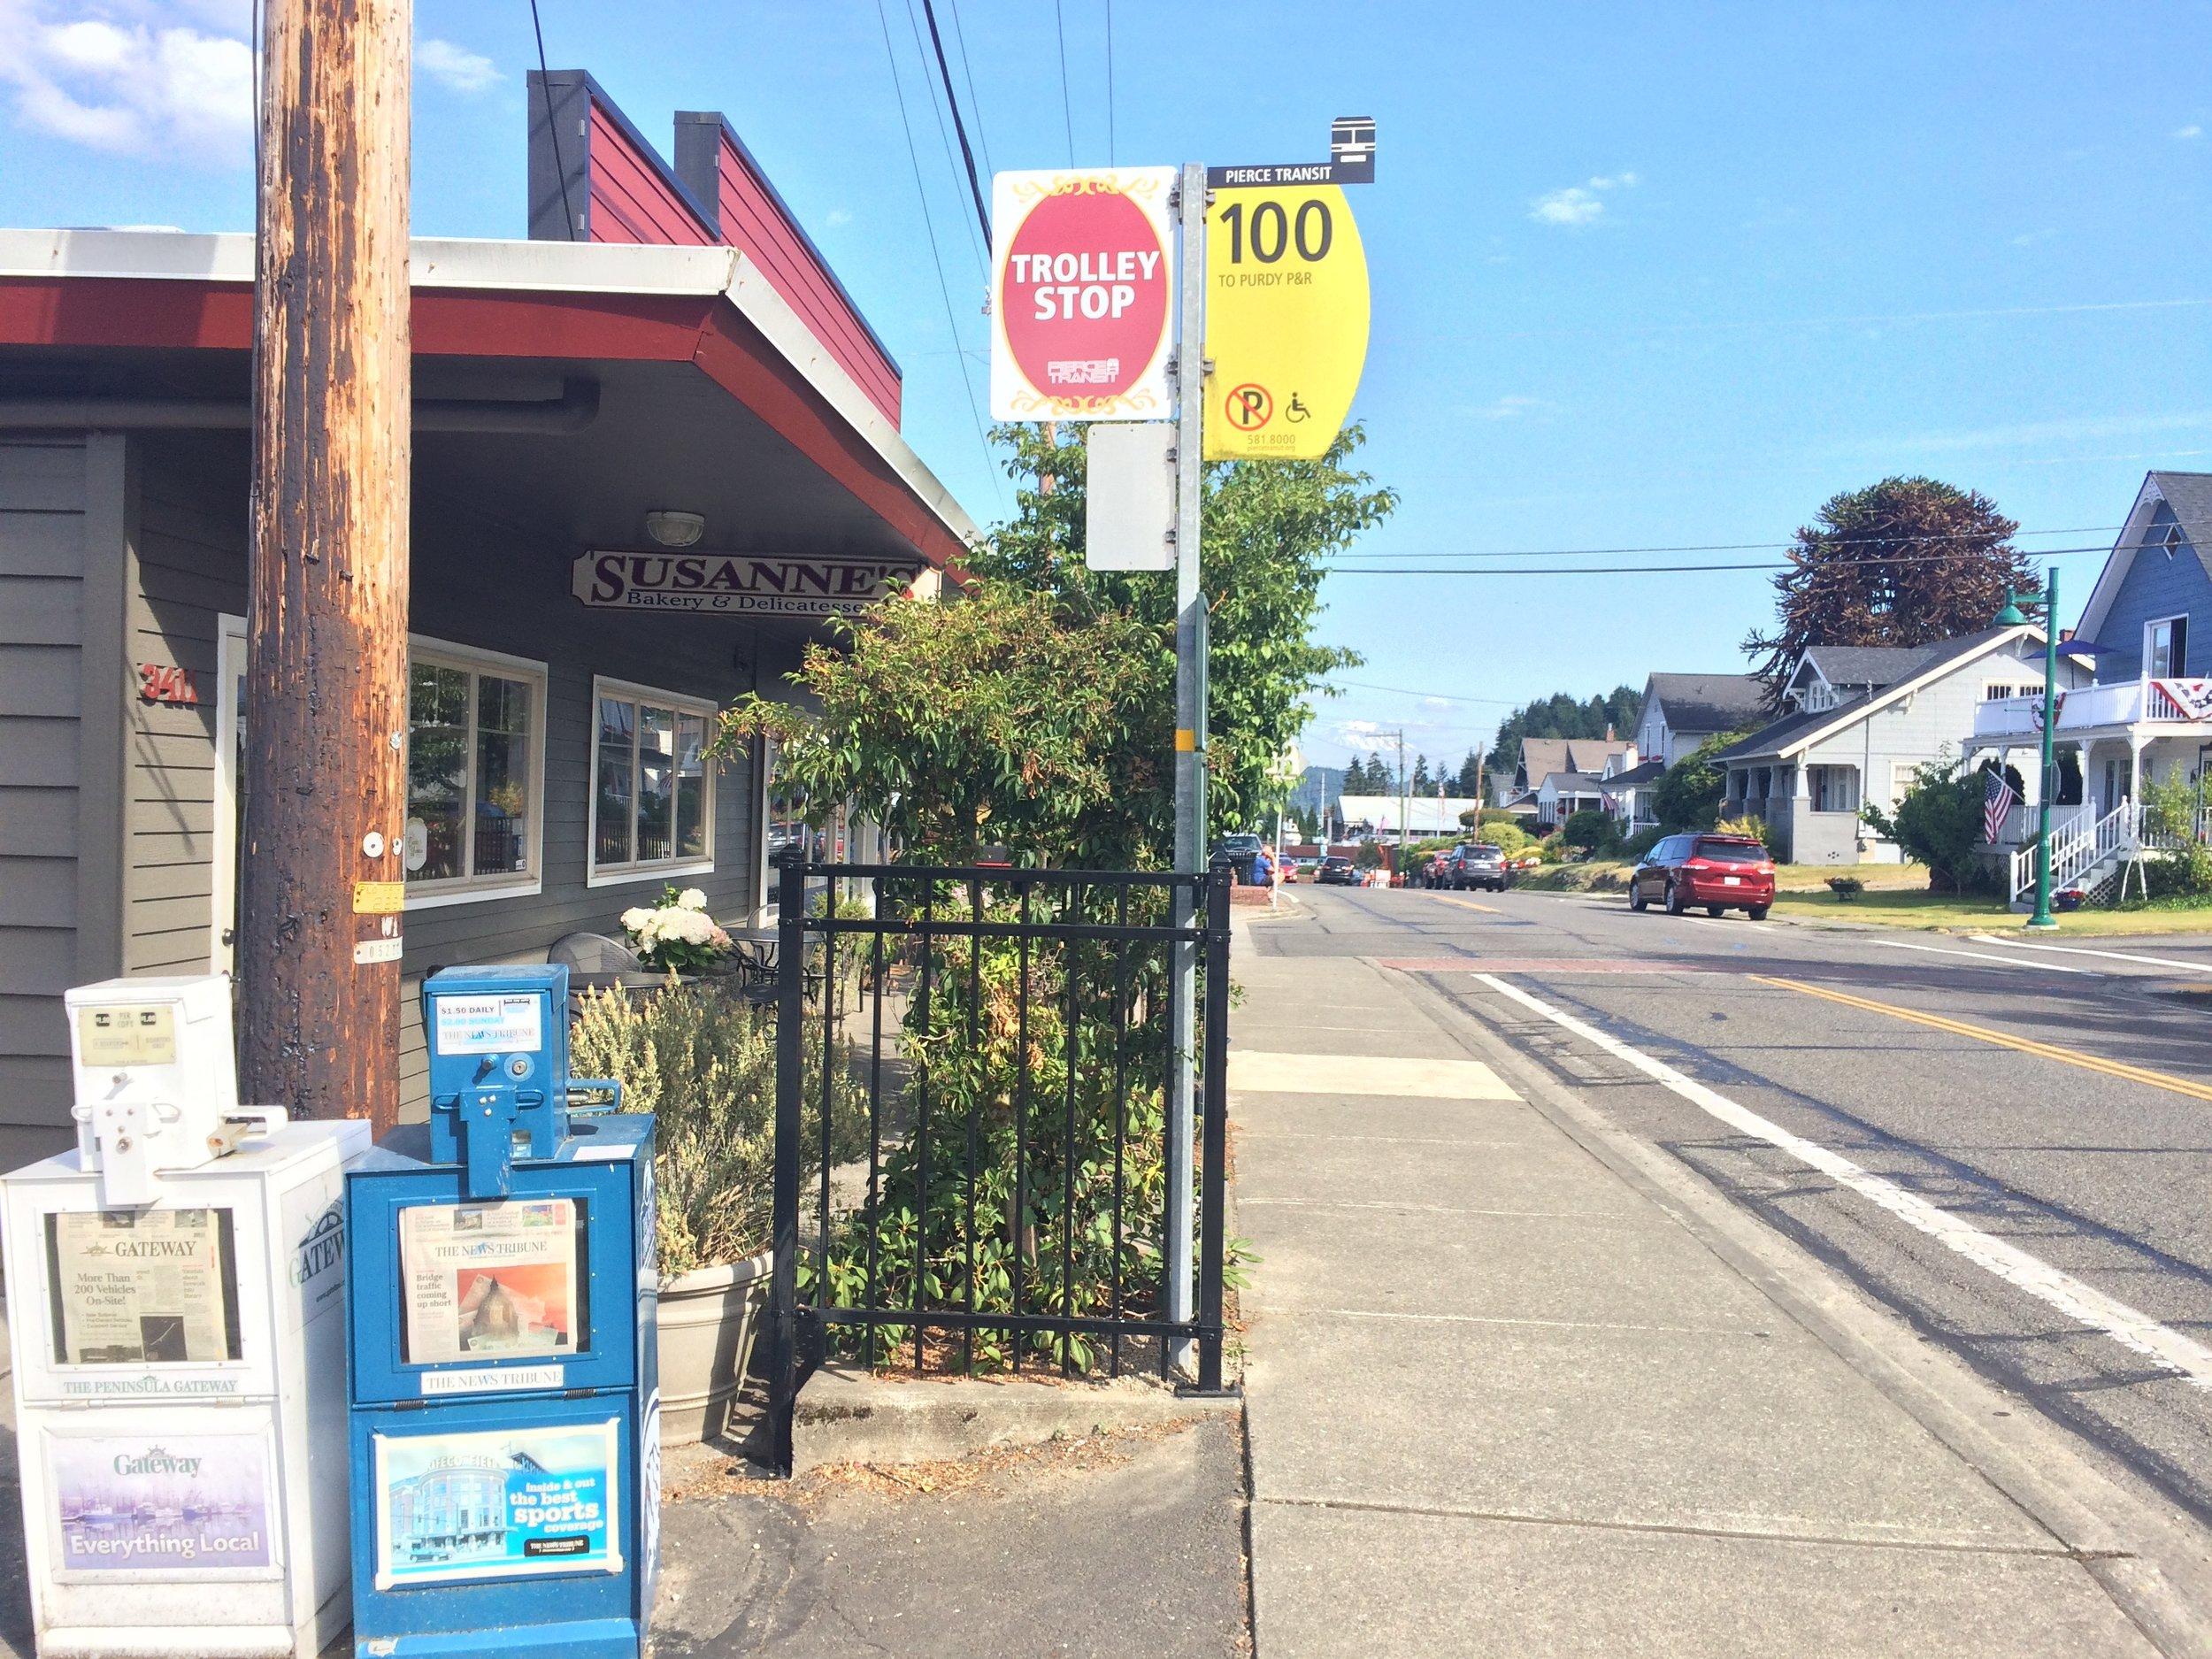 Susanne's Bakery & The Trolley Stop